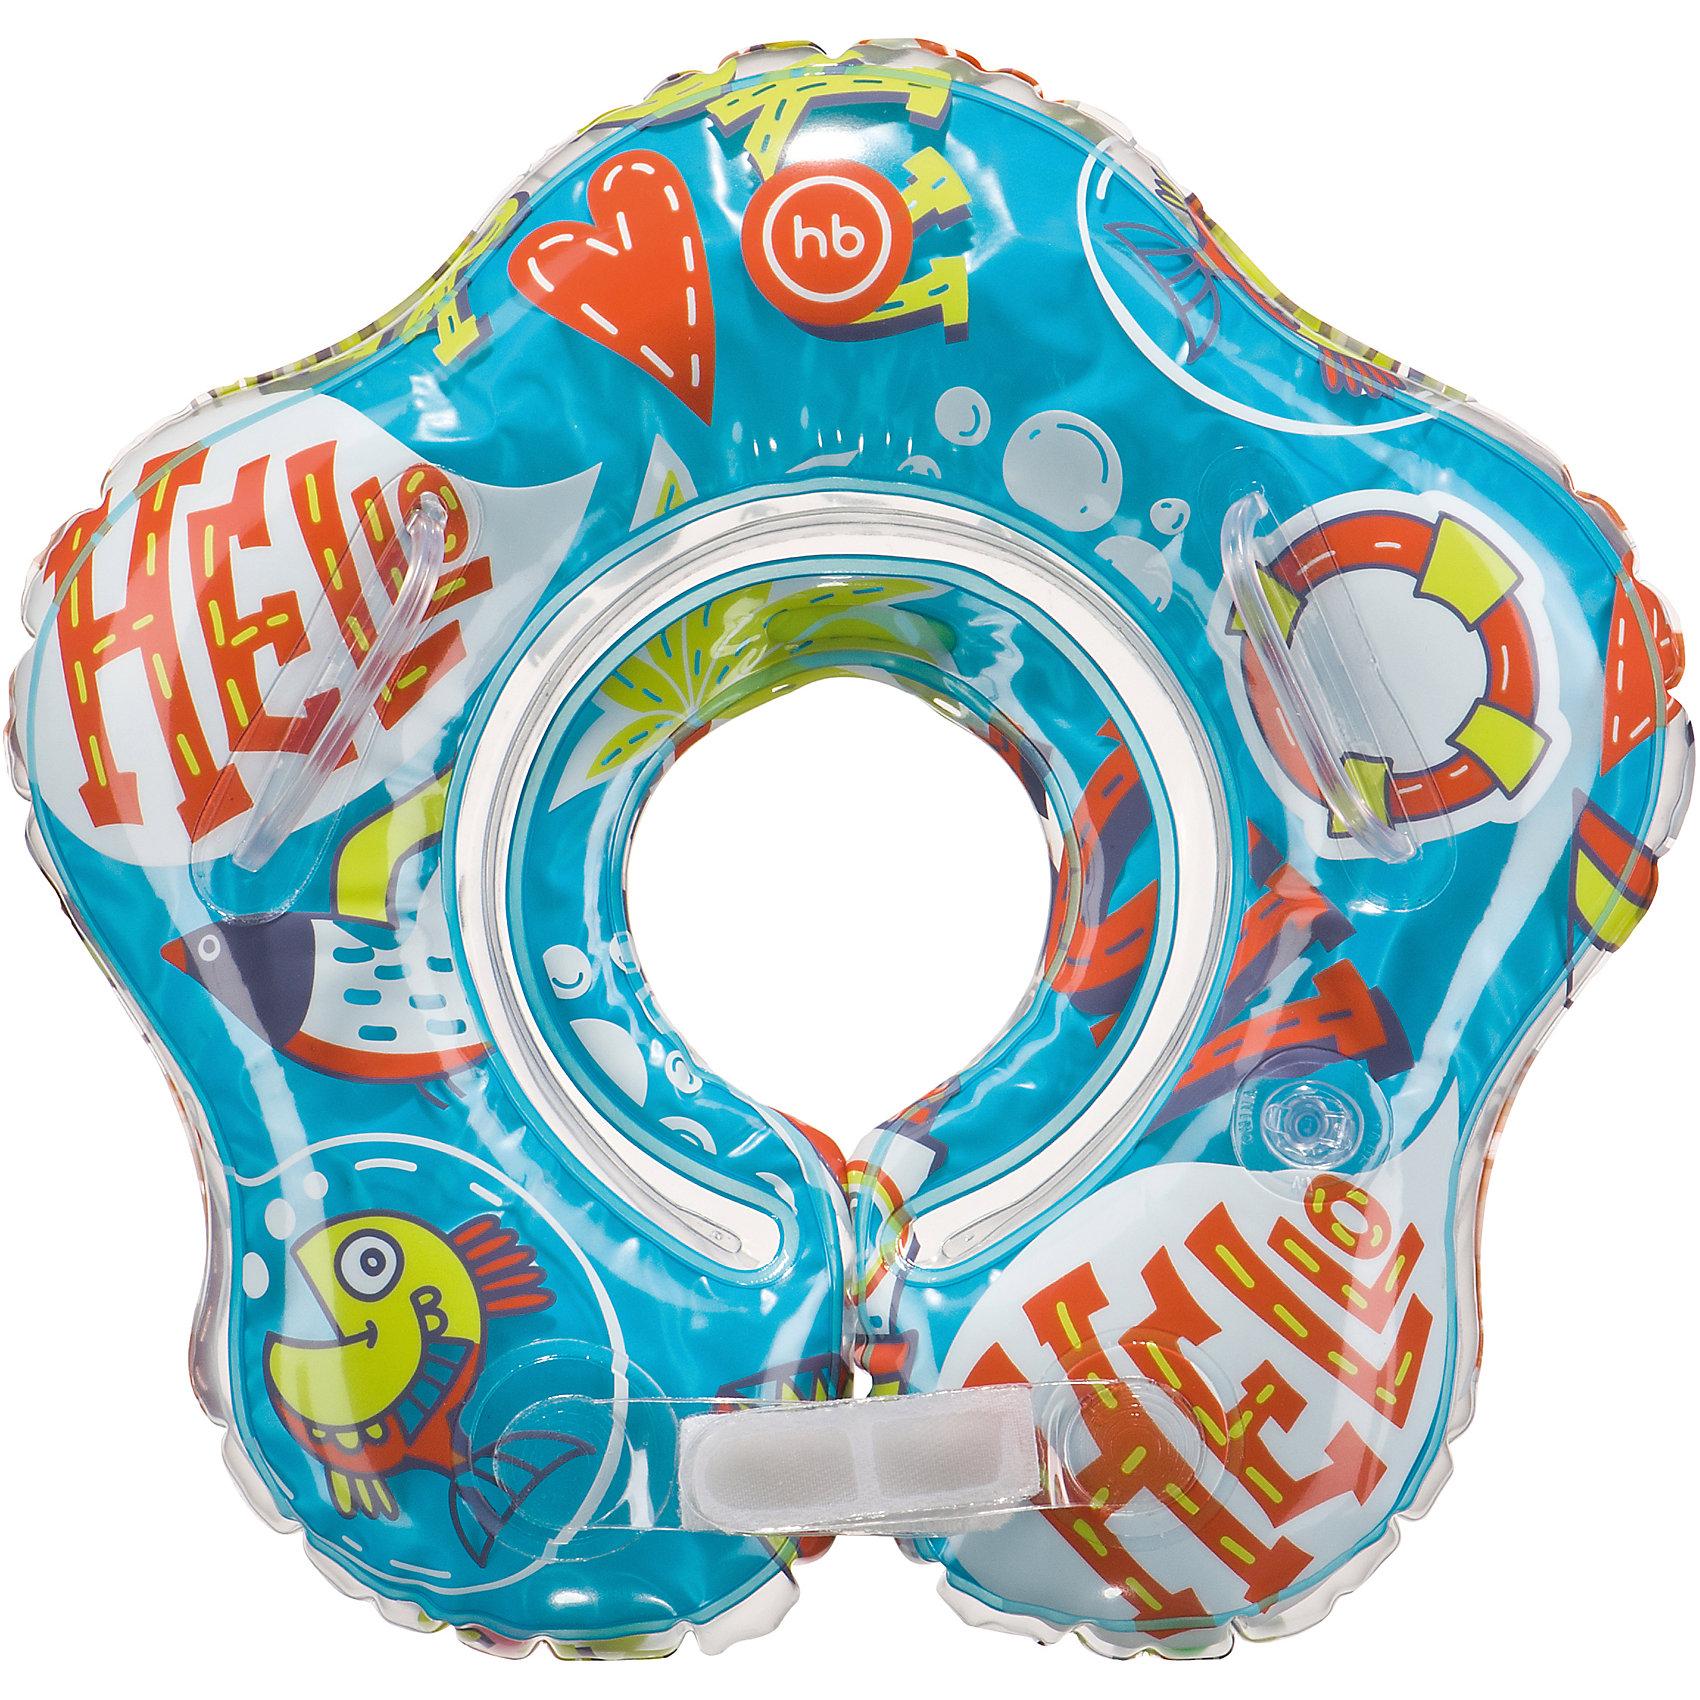 Happy Baby Надувной круг на шею DOLFY, Happy Baby roxi kids fl002 круг на шею для купания малышей